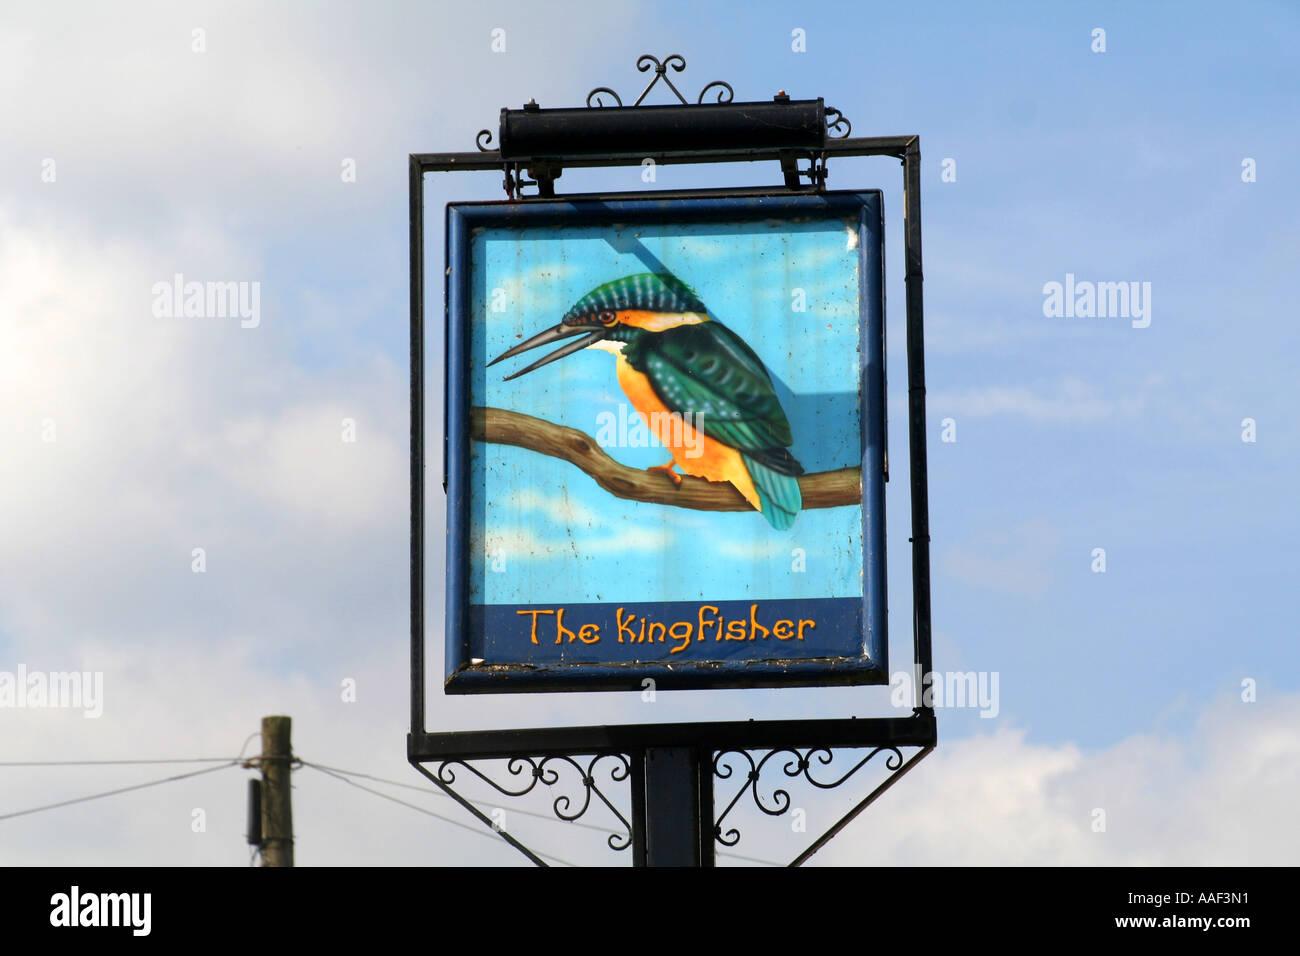 https://c8.alamy.com/comp/AAF3N1/pub-sign-from-the-now-demolished-kingfisher-pub-in-broxbourne-hertfordshire-AAF3N1.jpg